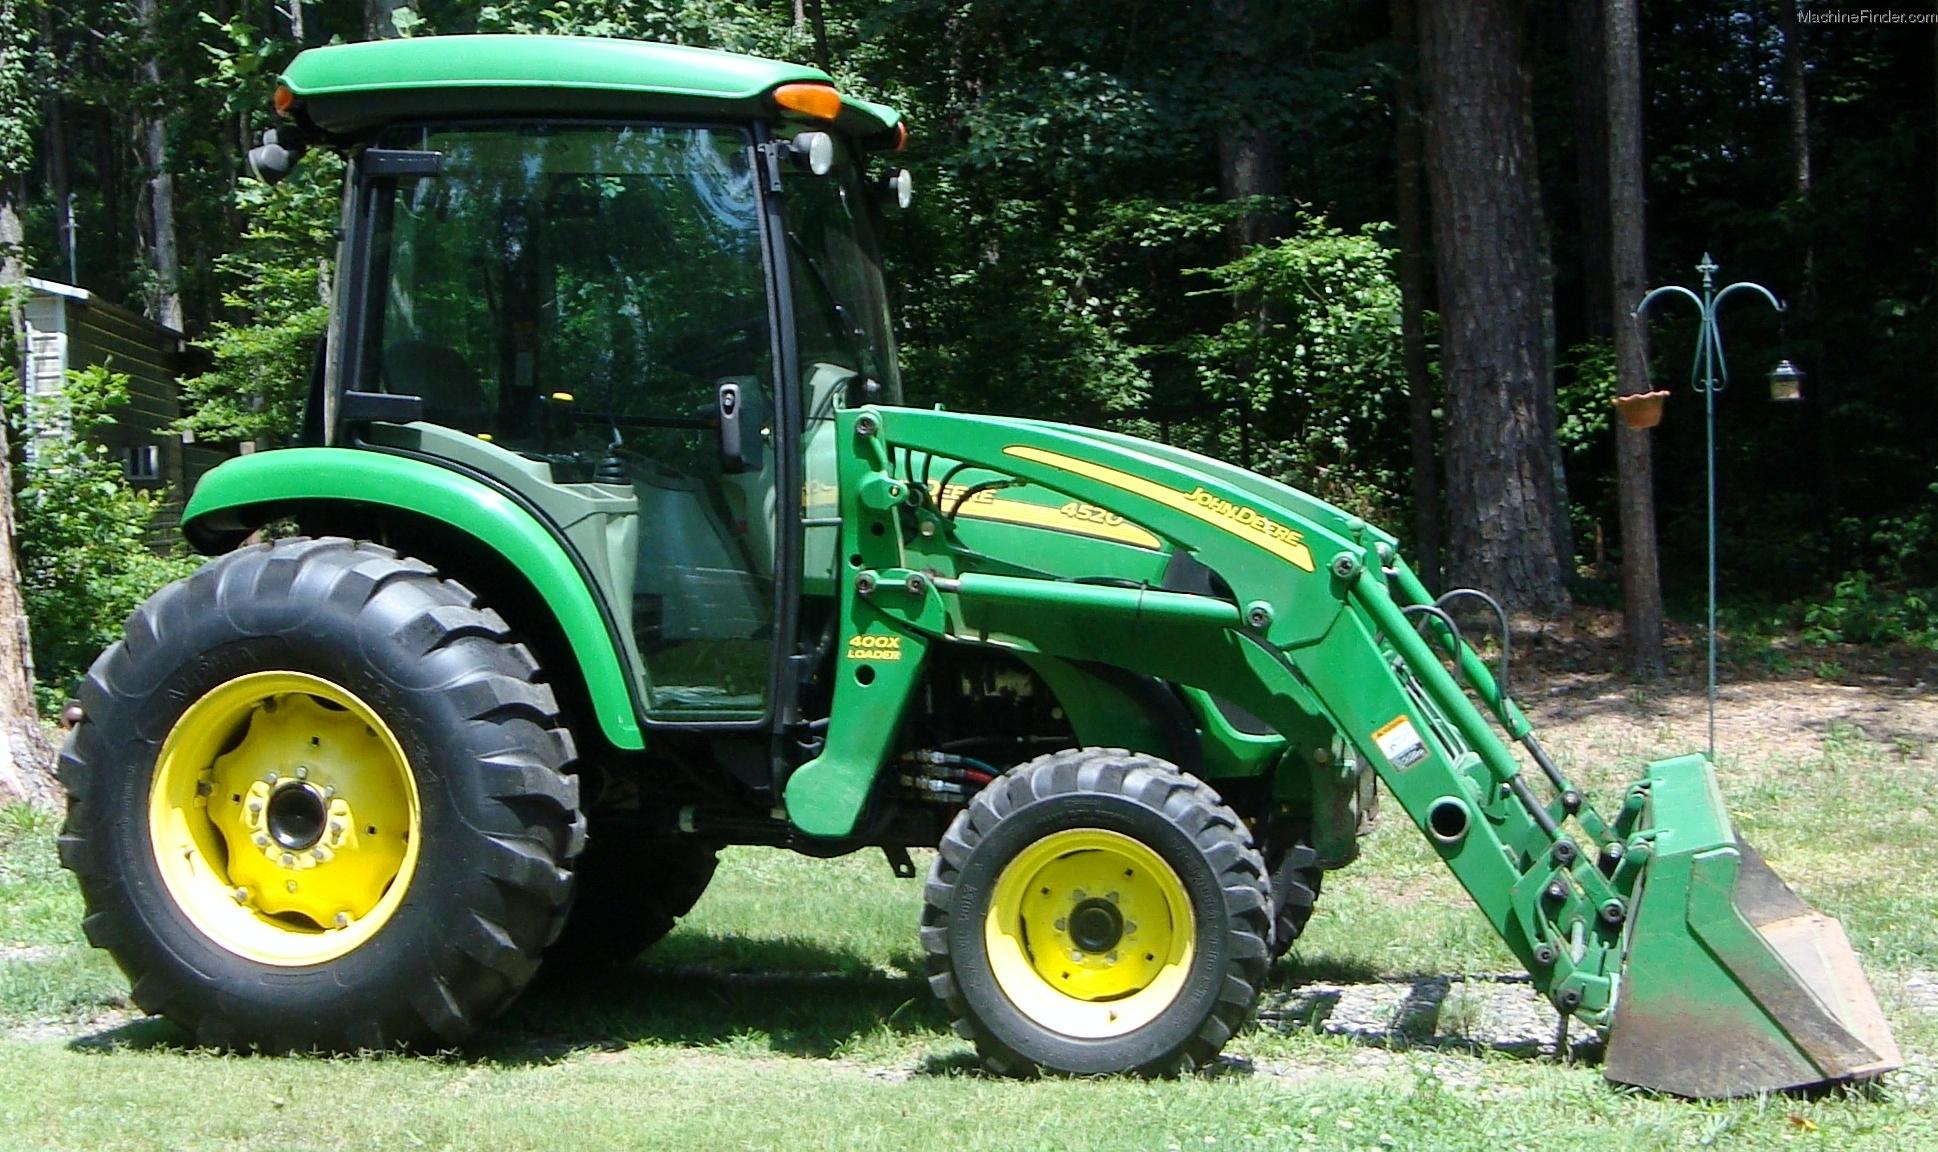 2010 John Deere 4520 Tractors - Compact (1-40hp.) - John ...